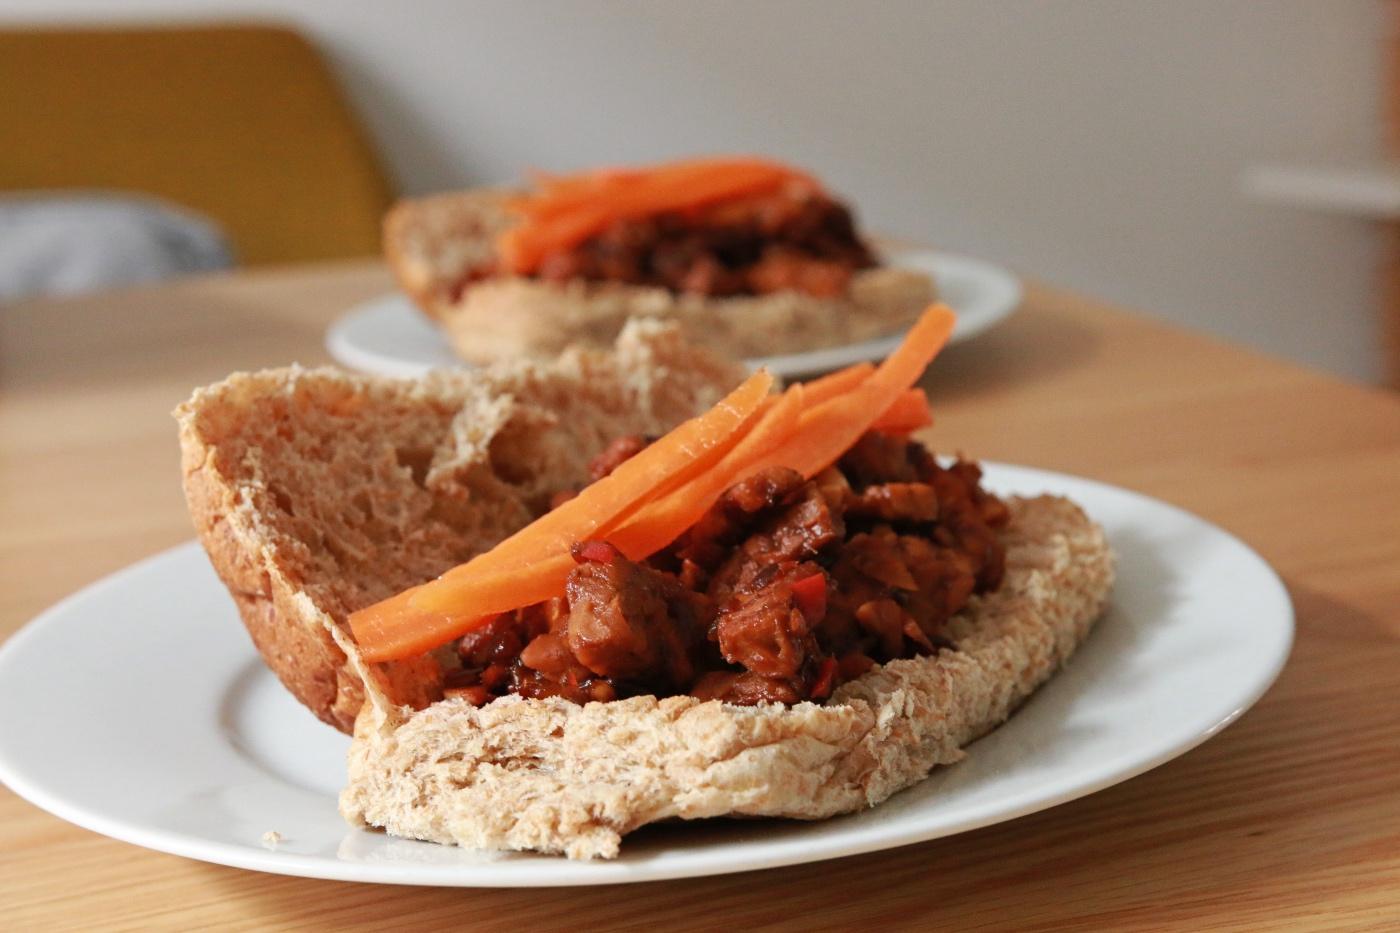 Vegan broodbeleg - broodje tempeh